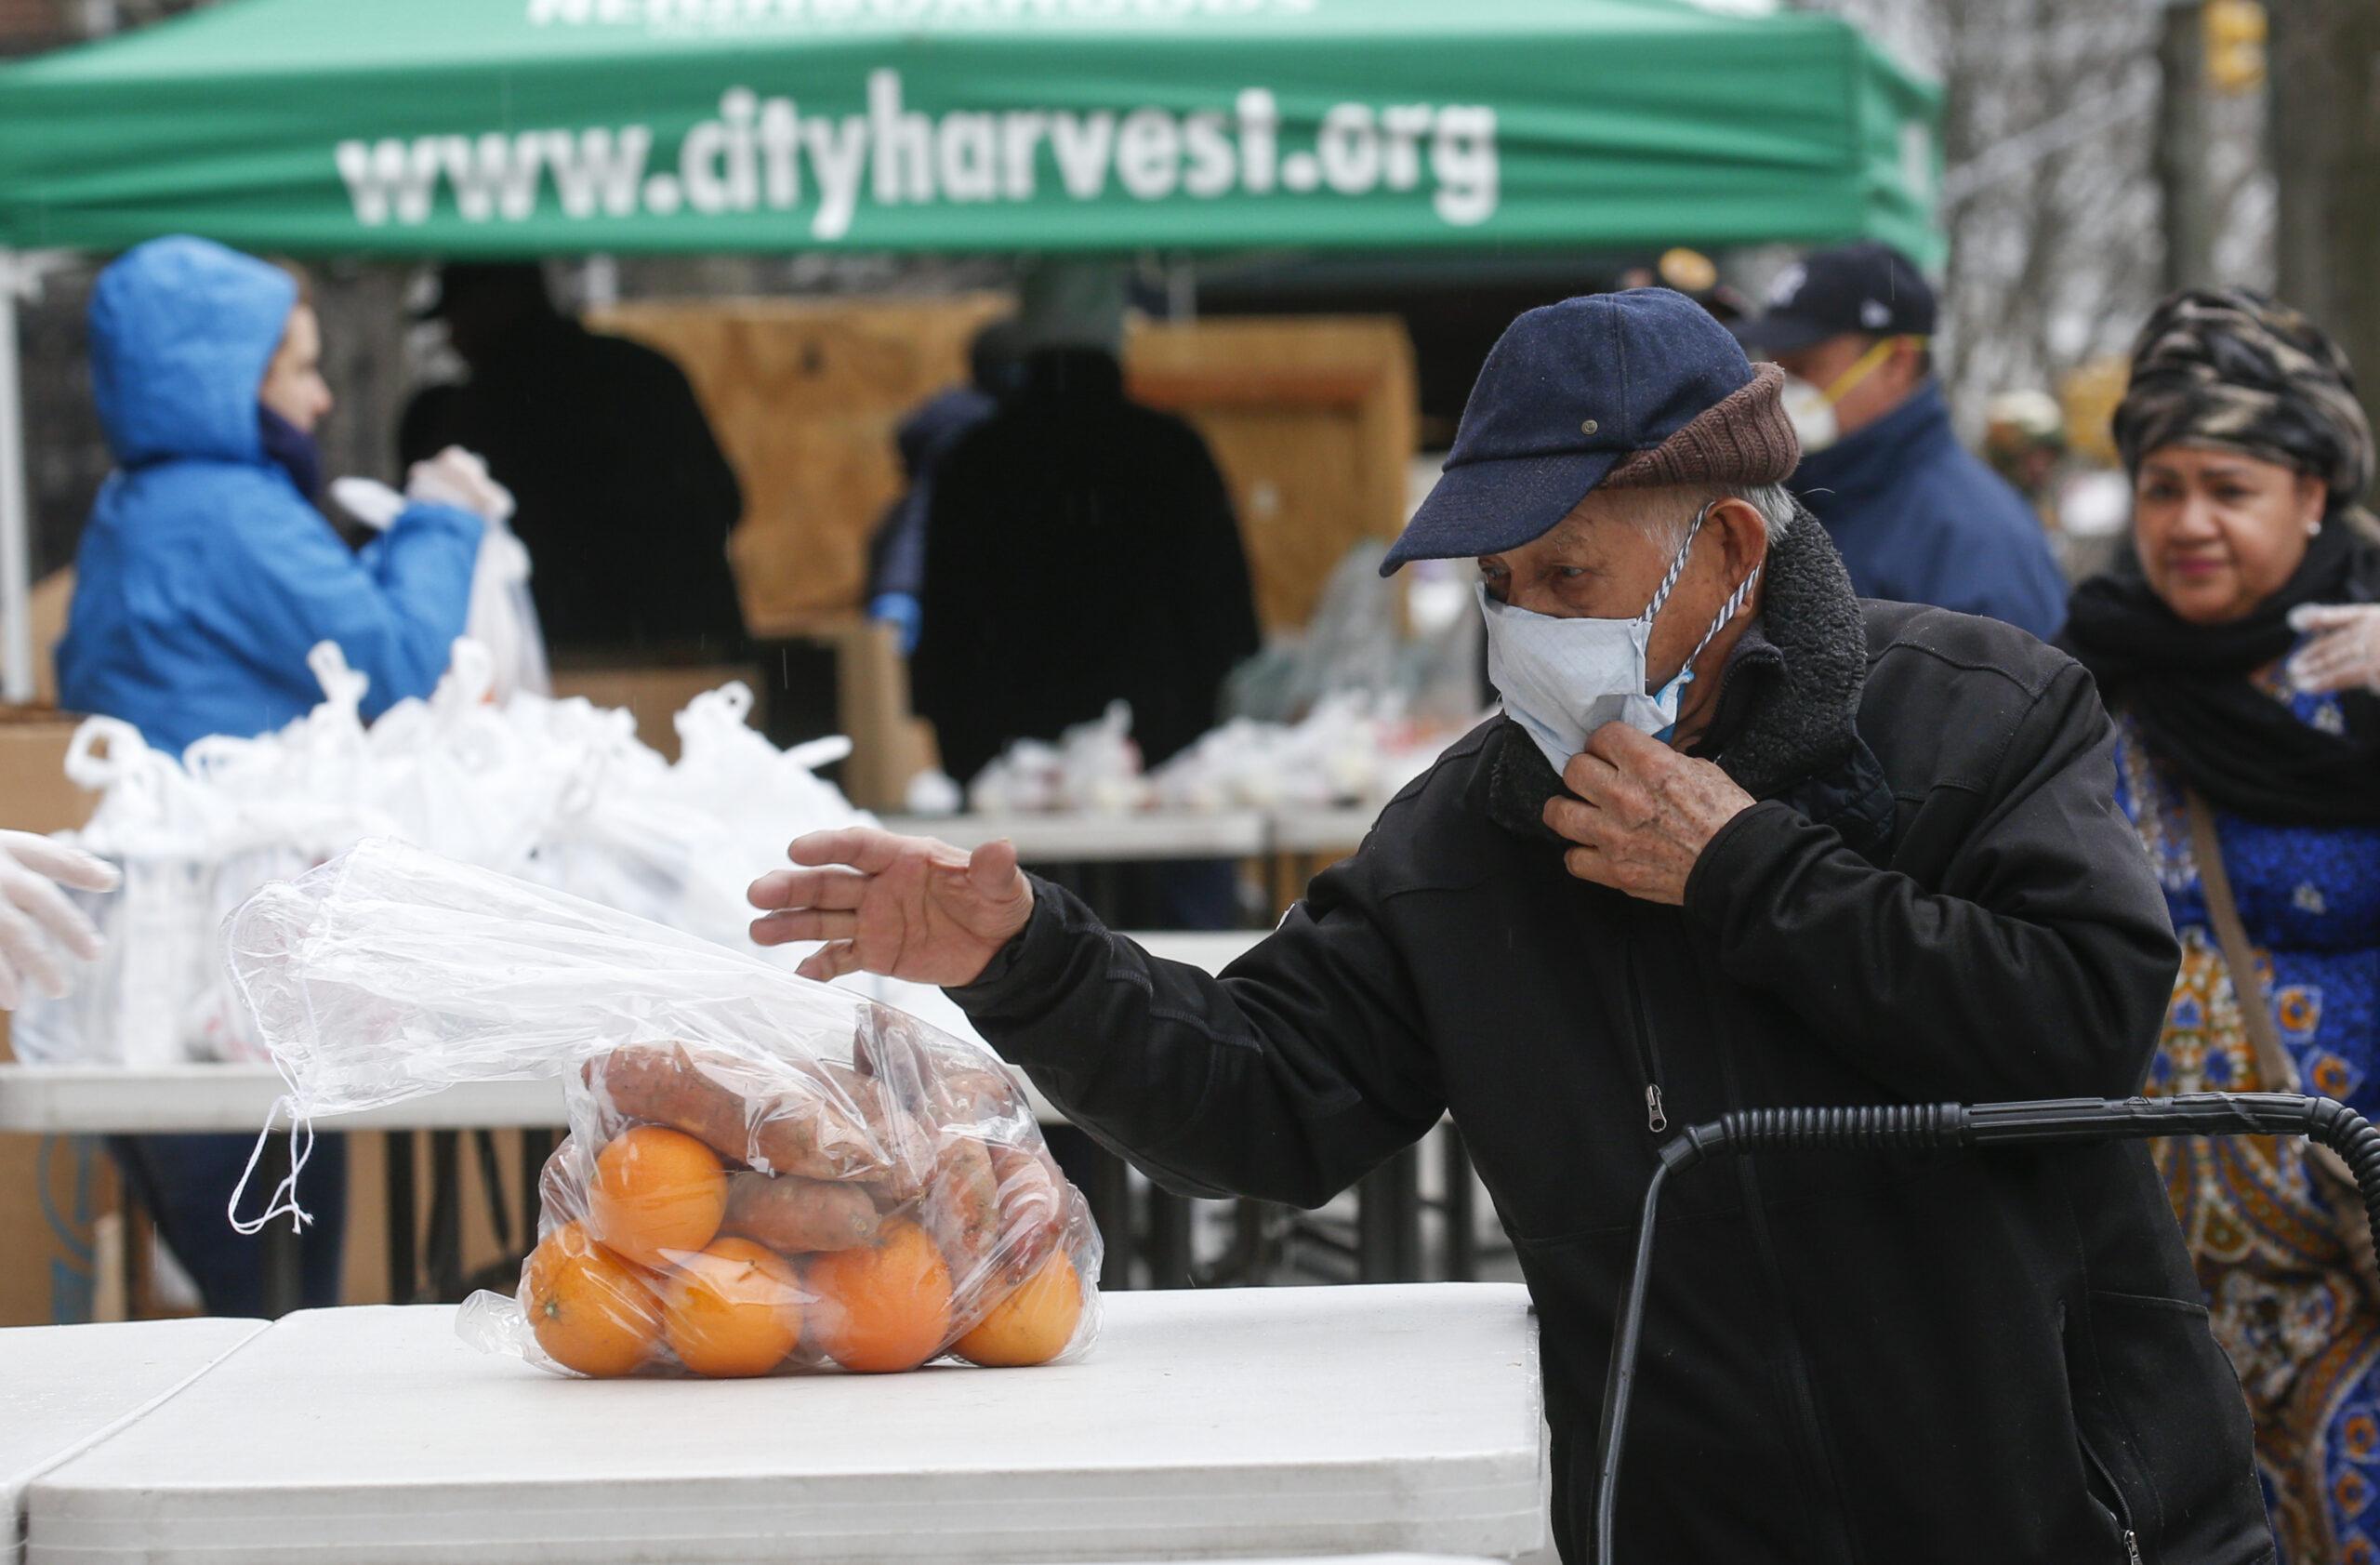 L.A food banks witness unprecedented surge in demand